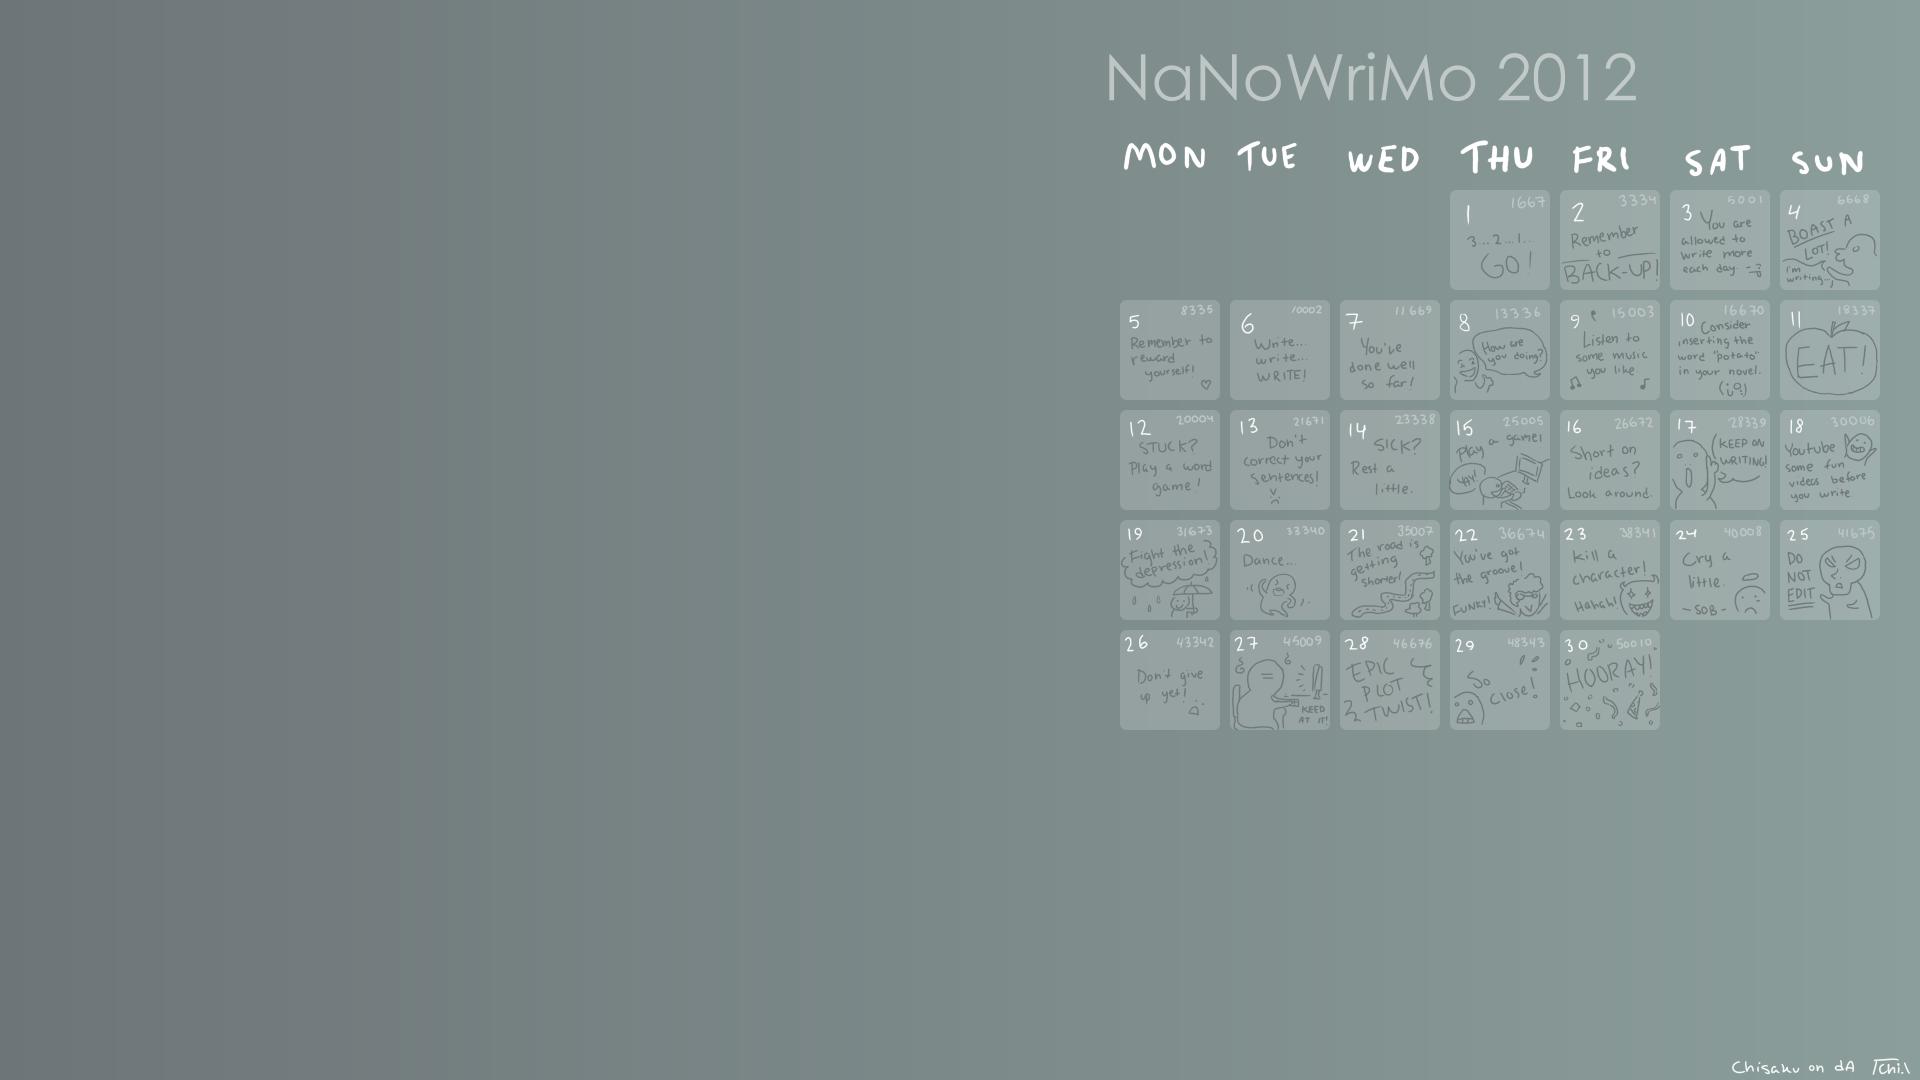 Diy Calendar Background : Diy nanowrimo calendar wallpaper gimp by chisaku on